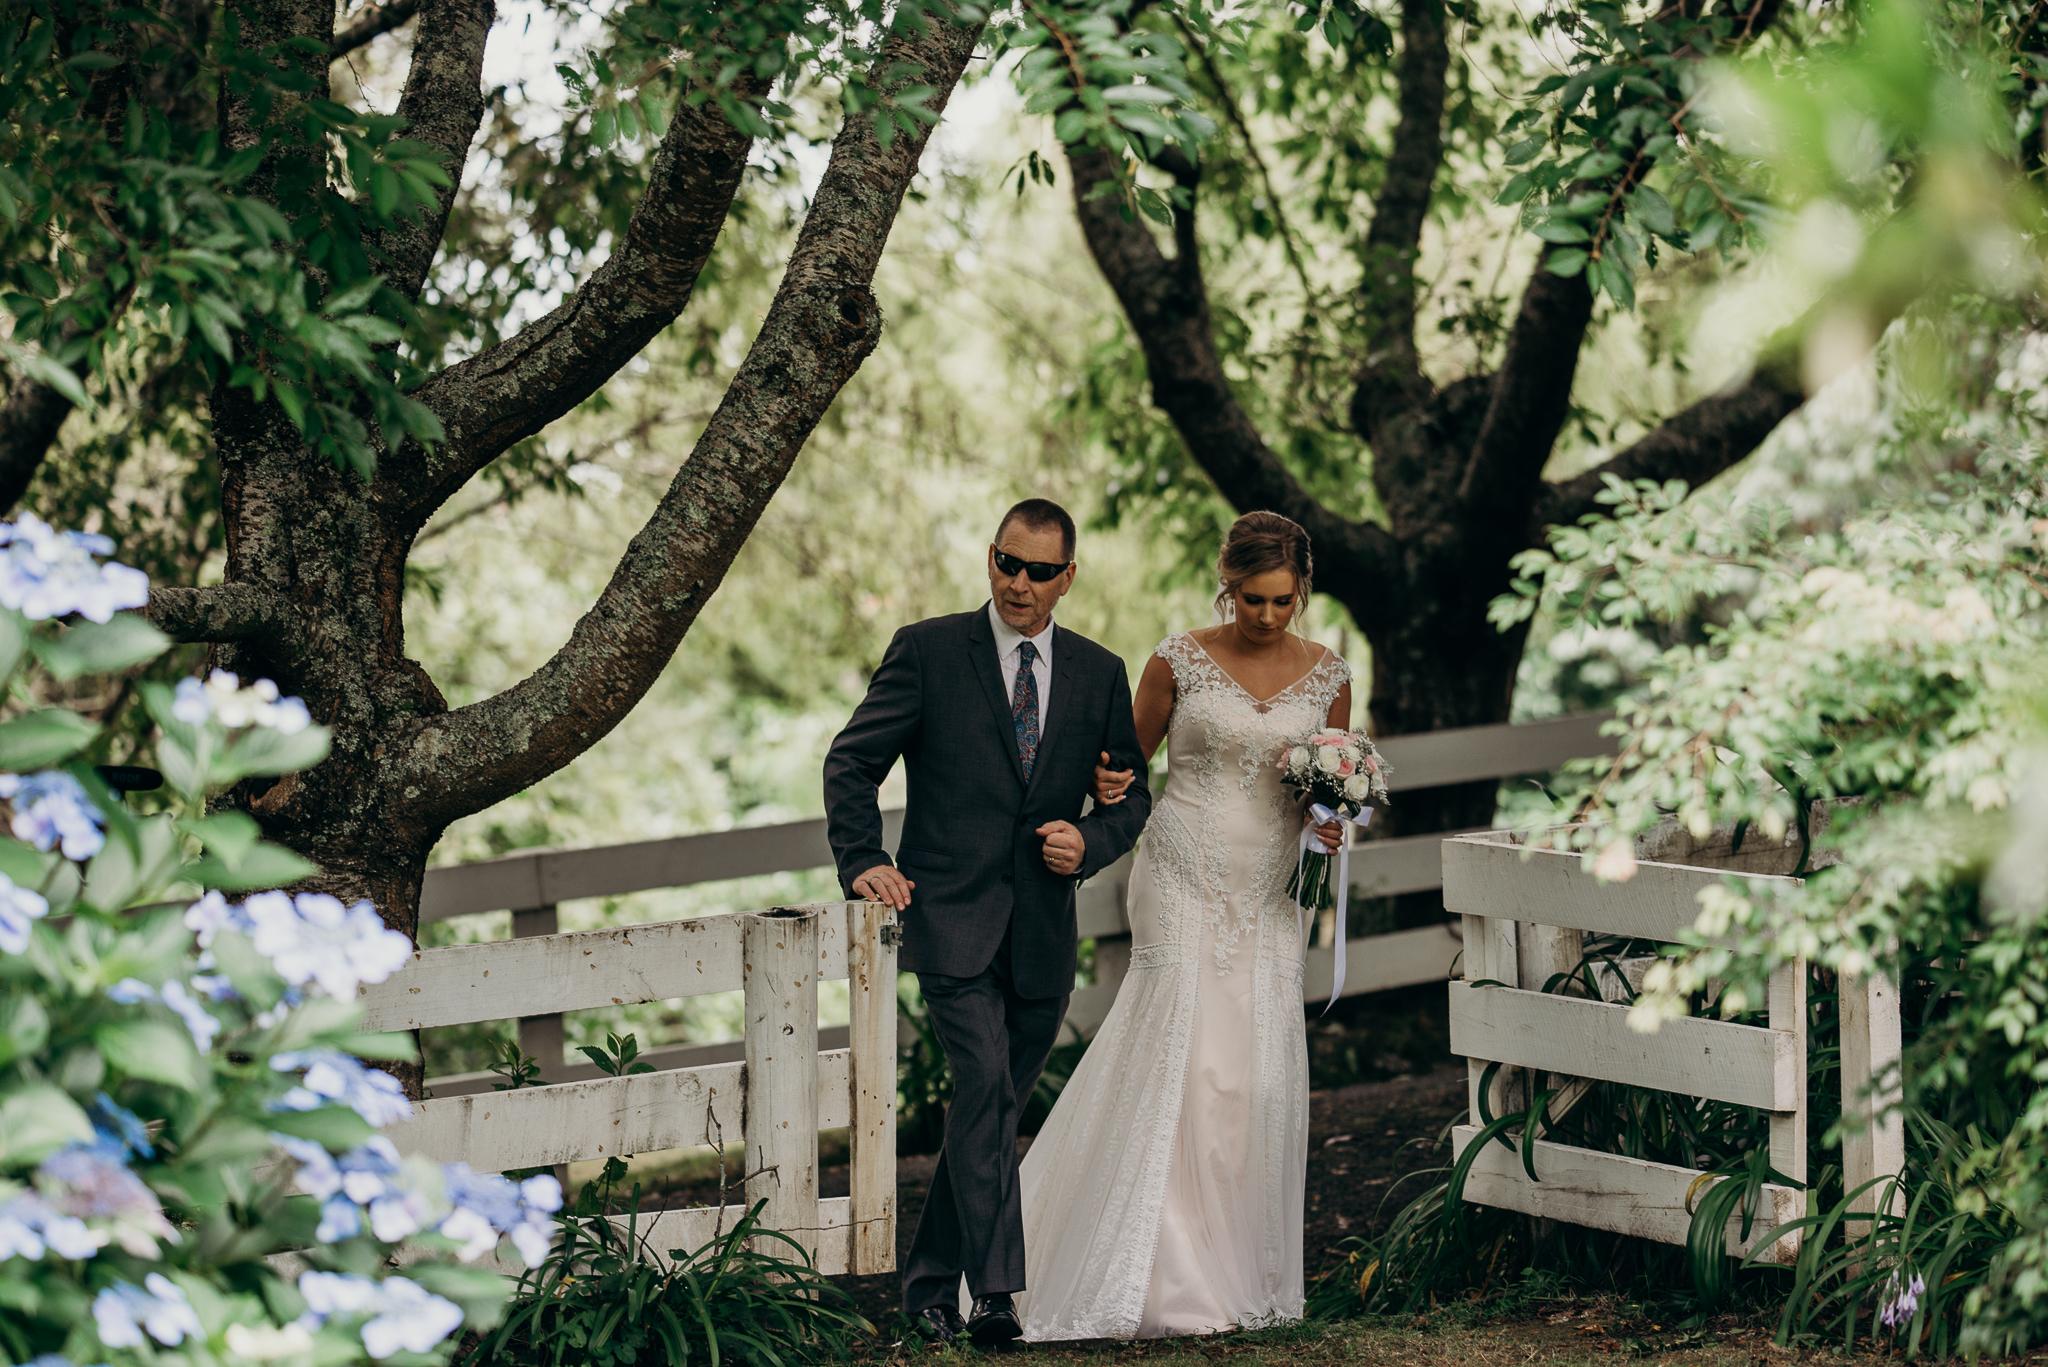 Tauranga-Coromandel-Elegant-Wedding-Photographer-Charlemagne-Lodge-61.jpg